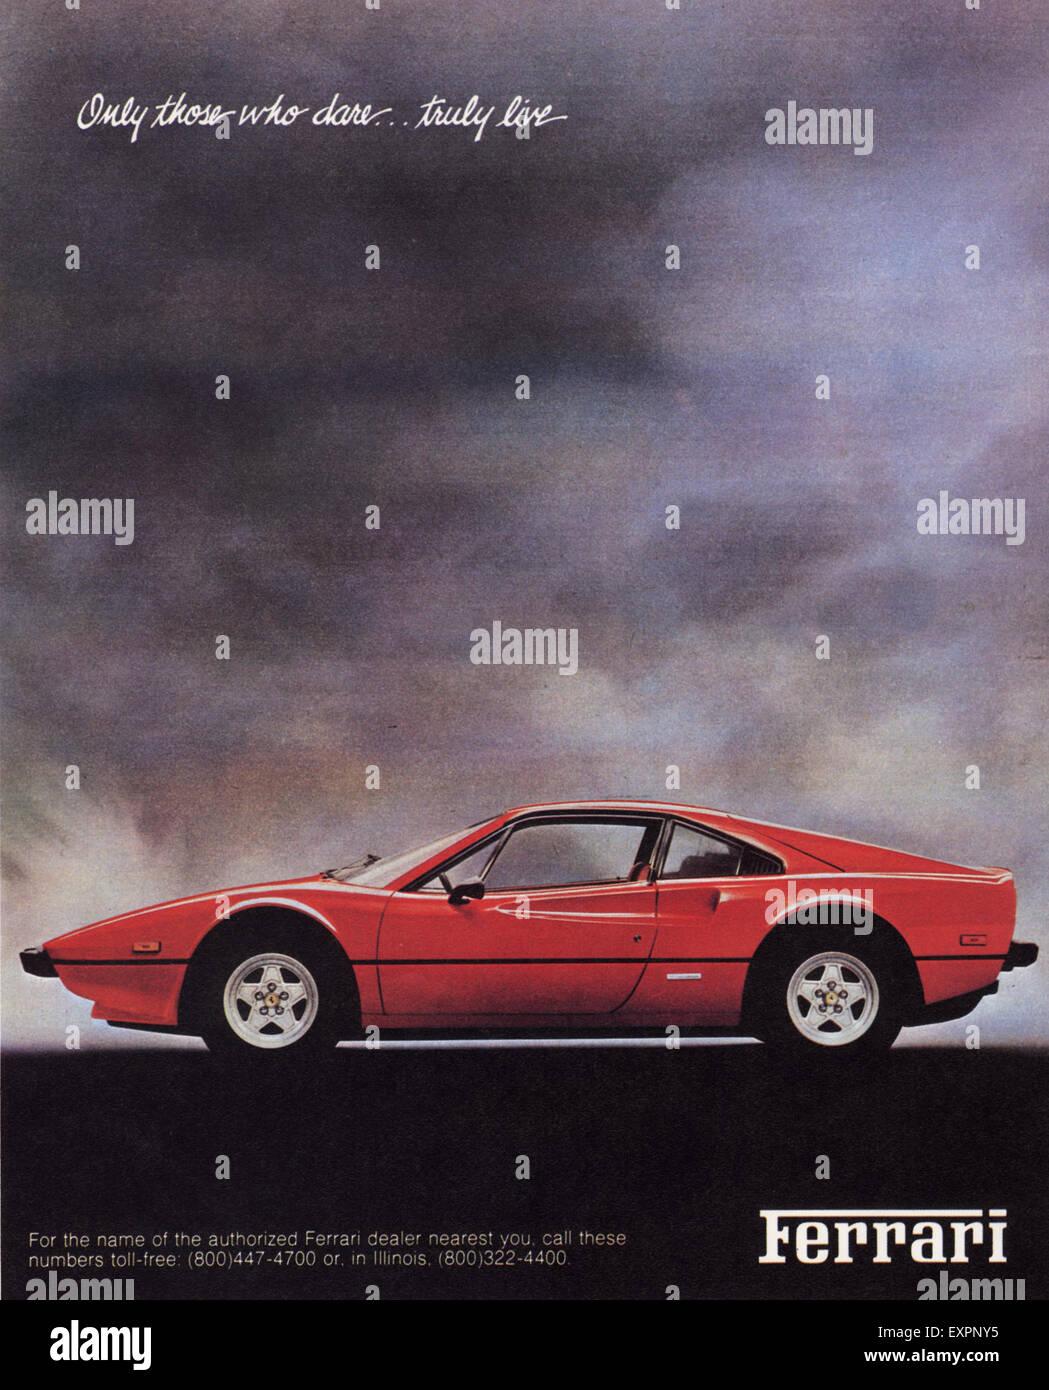 1980s Uk Ferrari Magazine Advert Stock Photo Alamy